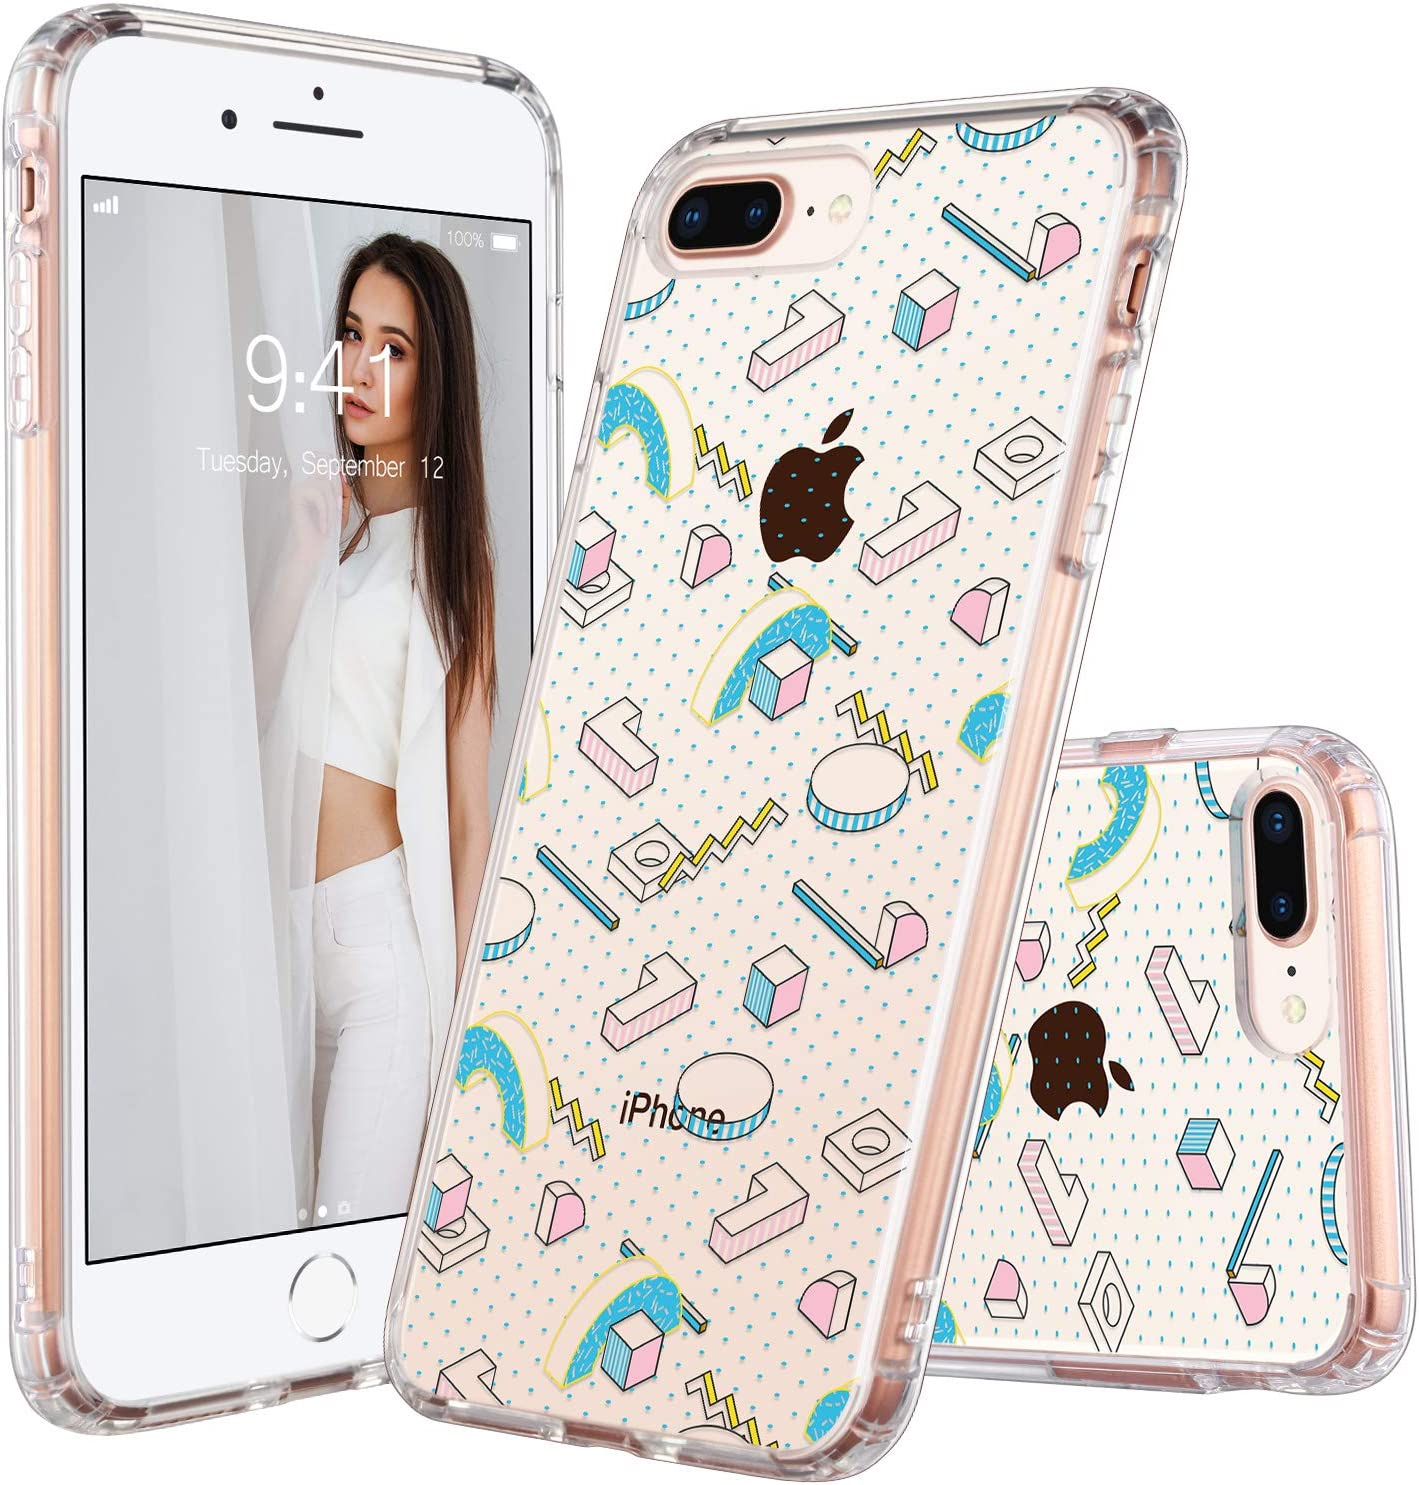 ULAK iPhone 7 Plus Case, iPhone 8 Plus Case Clear with Design Flexible Soft TPU Bumper Shock-Absorption Anti-Scratch Bumper Hard Back Cover for iPhone 7 Plus/8 Plus 5.5 inch (3D Shapes)